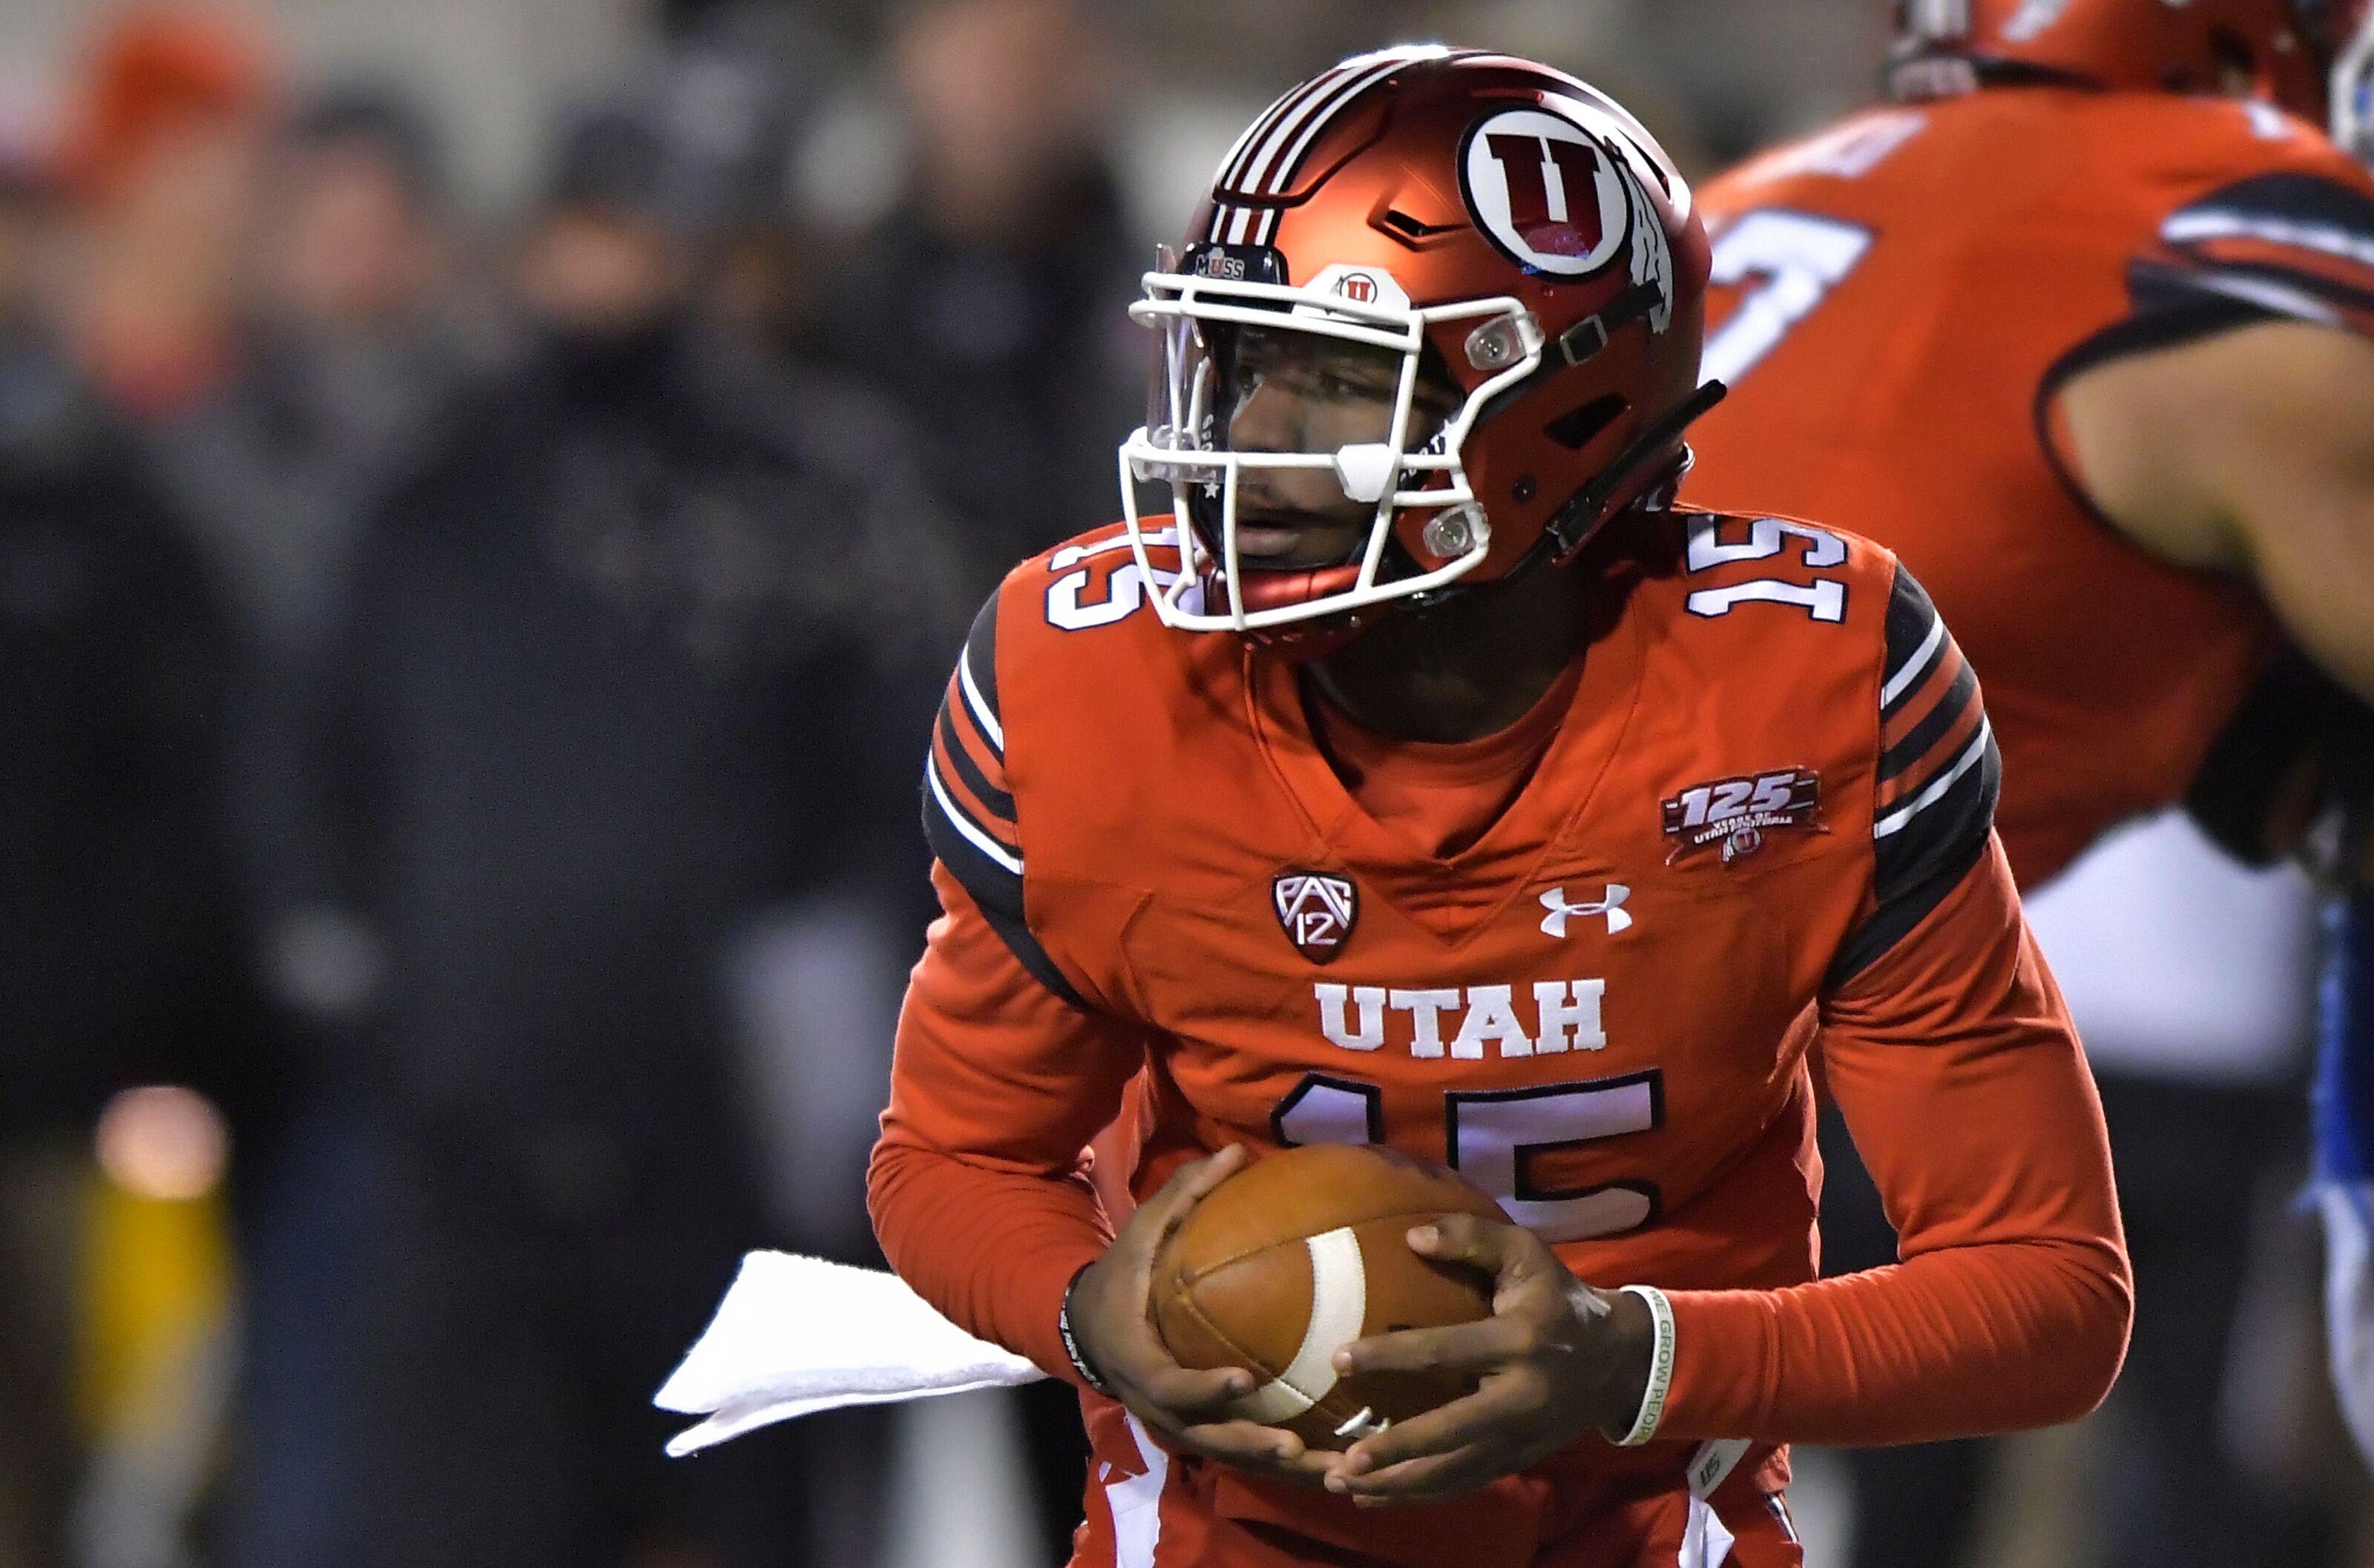 Utah Football: 3 takeaways from Holy War comeback win over BYU